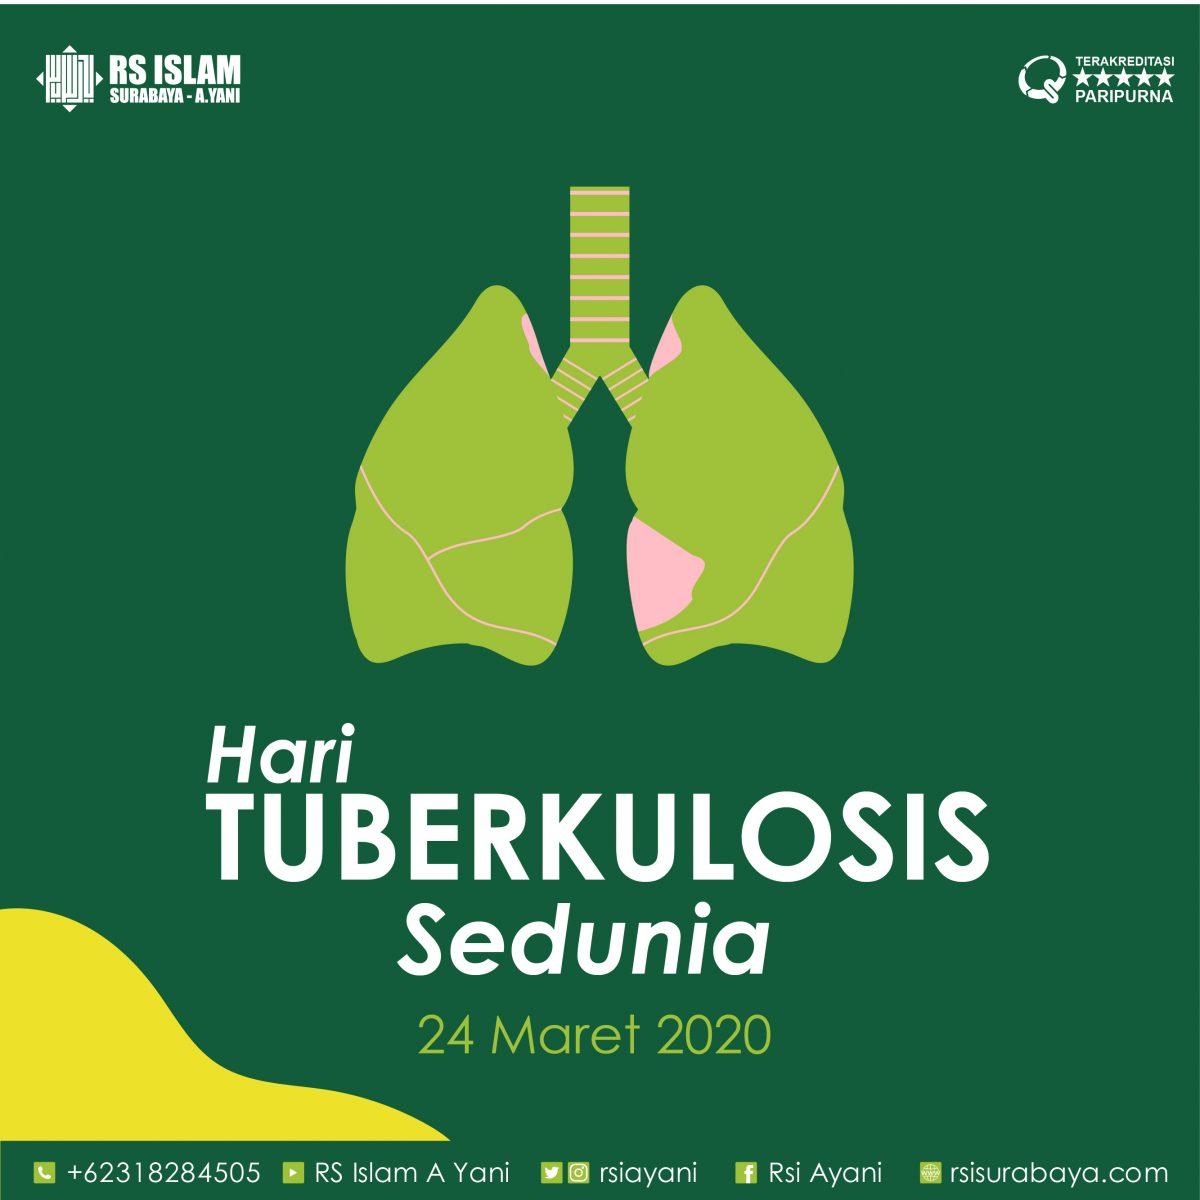 hari-tuberkulosis-rsi-01-1200x1200.jpg